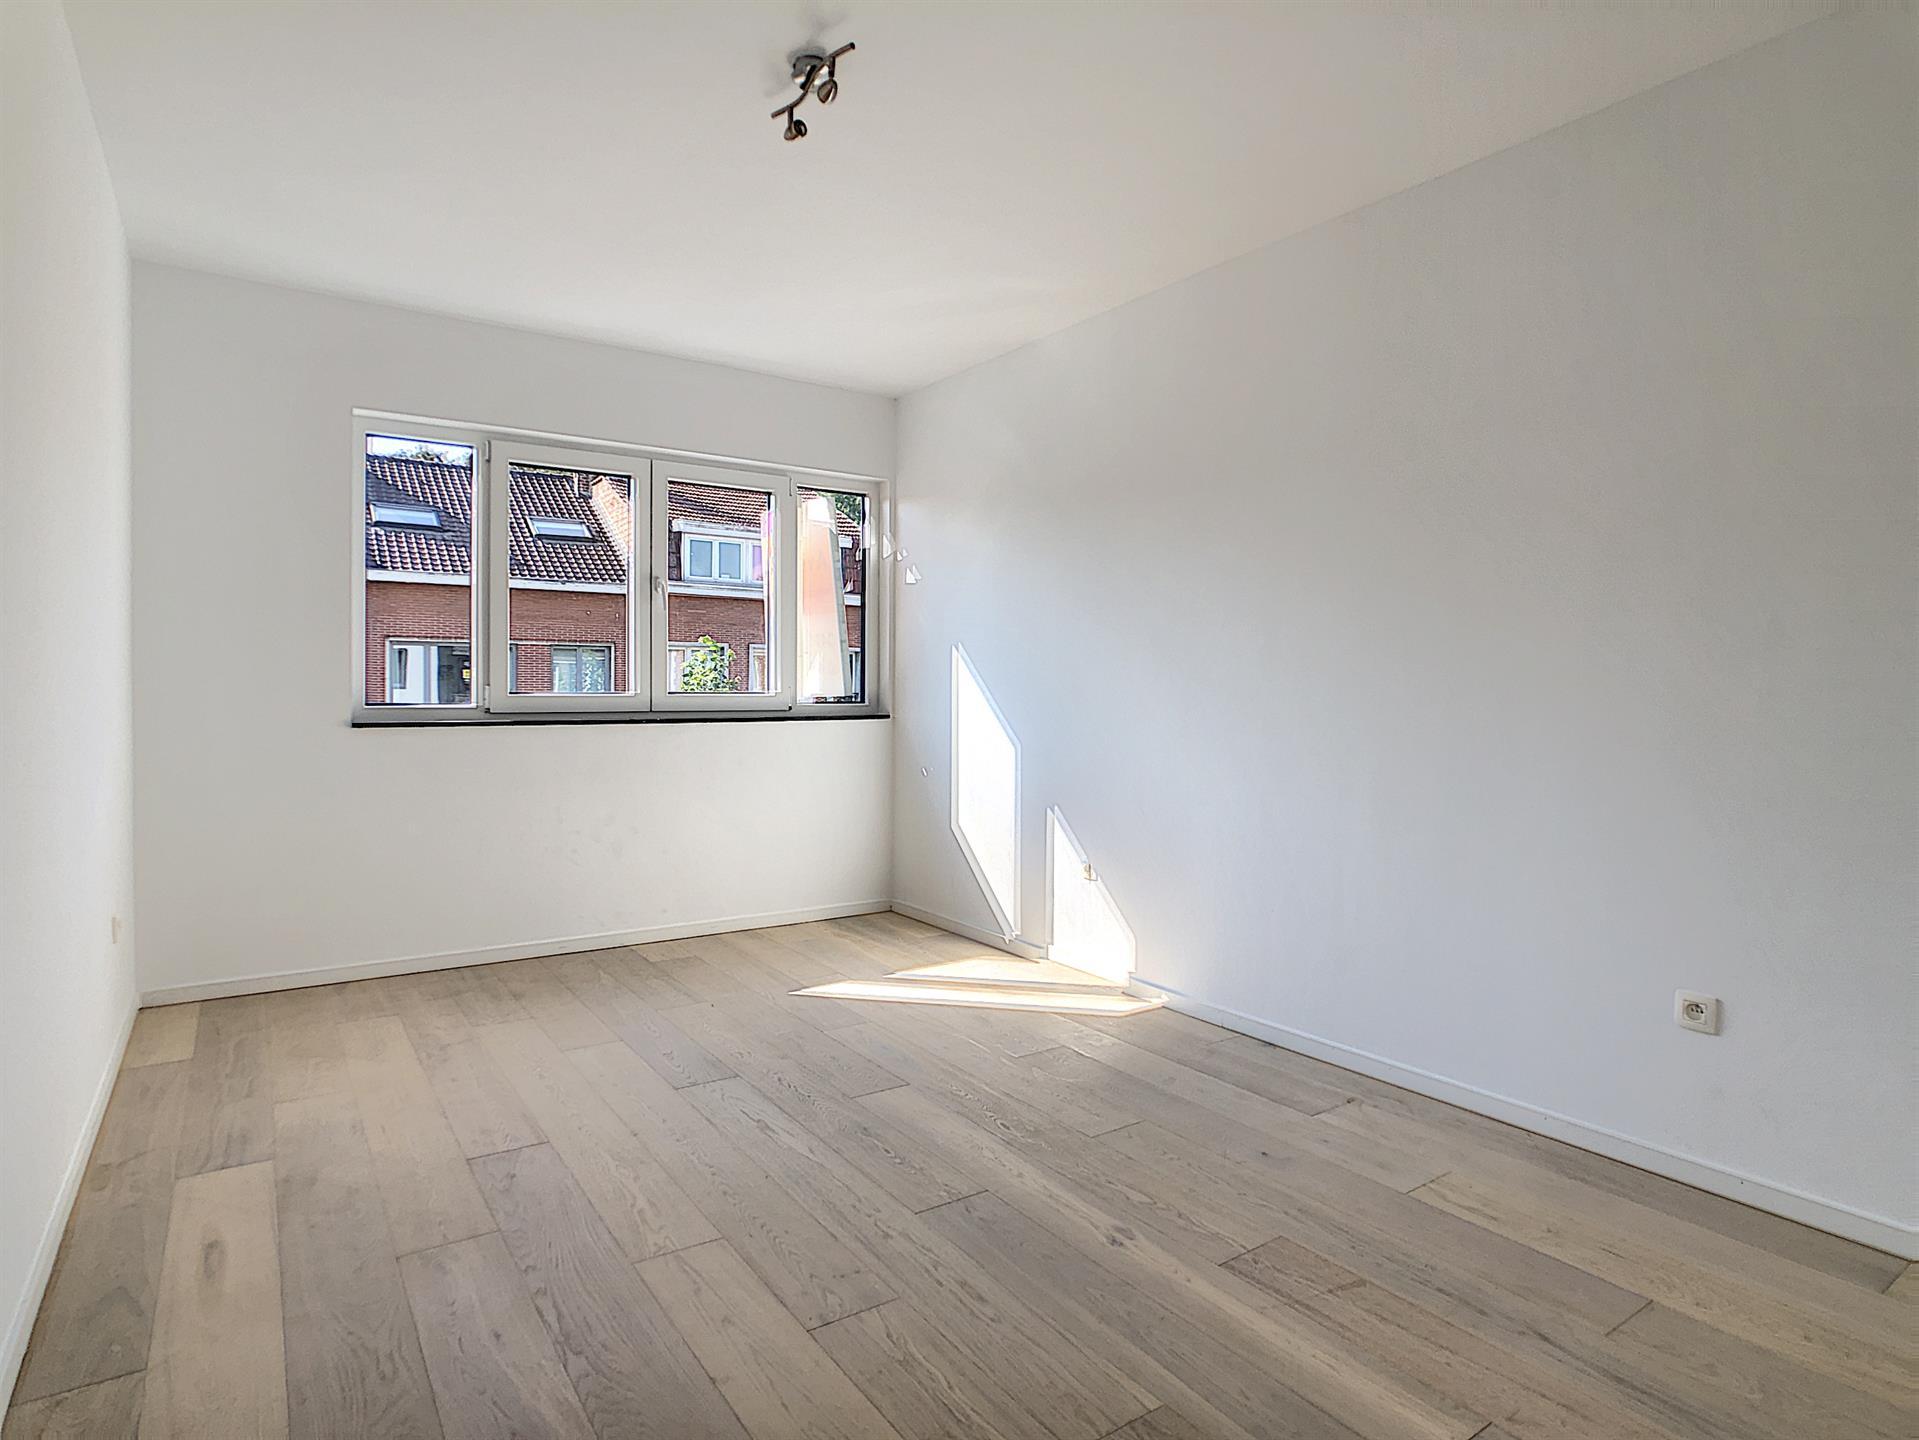 Appartement - Anderlecht - #4252385-28